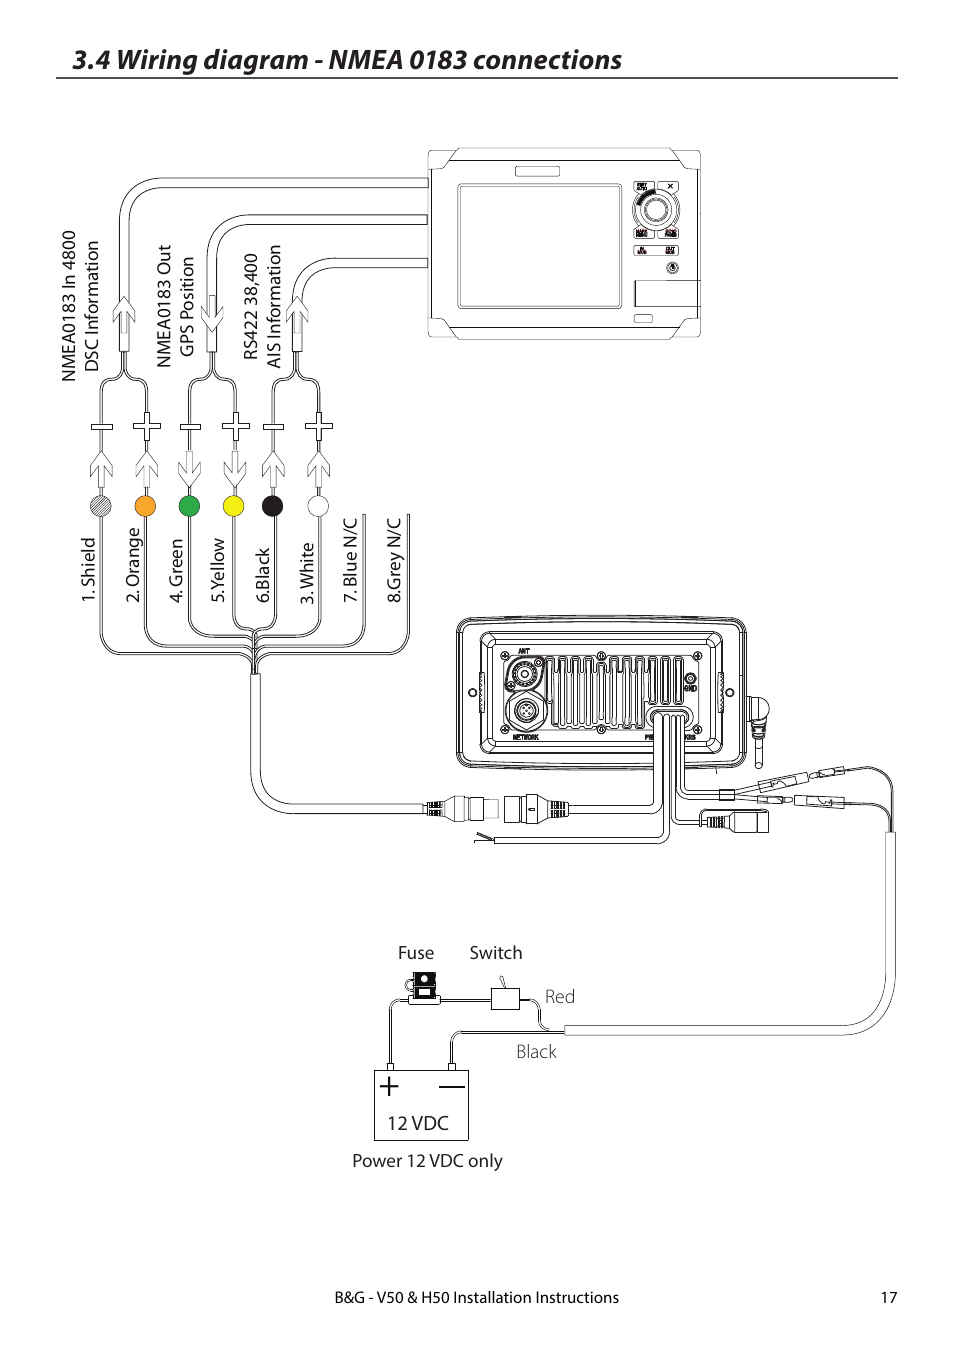 4 wiring diagram - nmea 0183 connections | B&G H50 Wireless ... on raymarine seatalk wiring, synchro wiring, transducer wiring, nasa wiring, abyc wiring, usb wiring, smartcraft wiring,